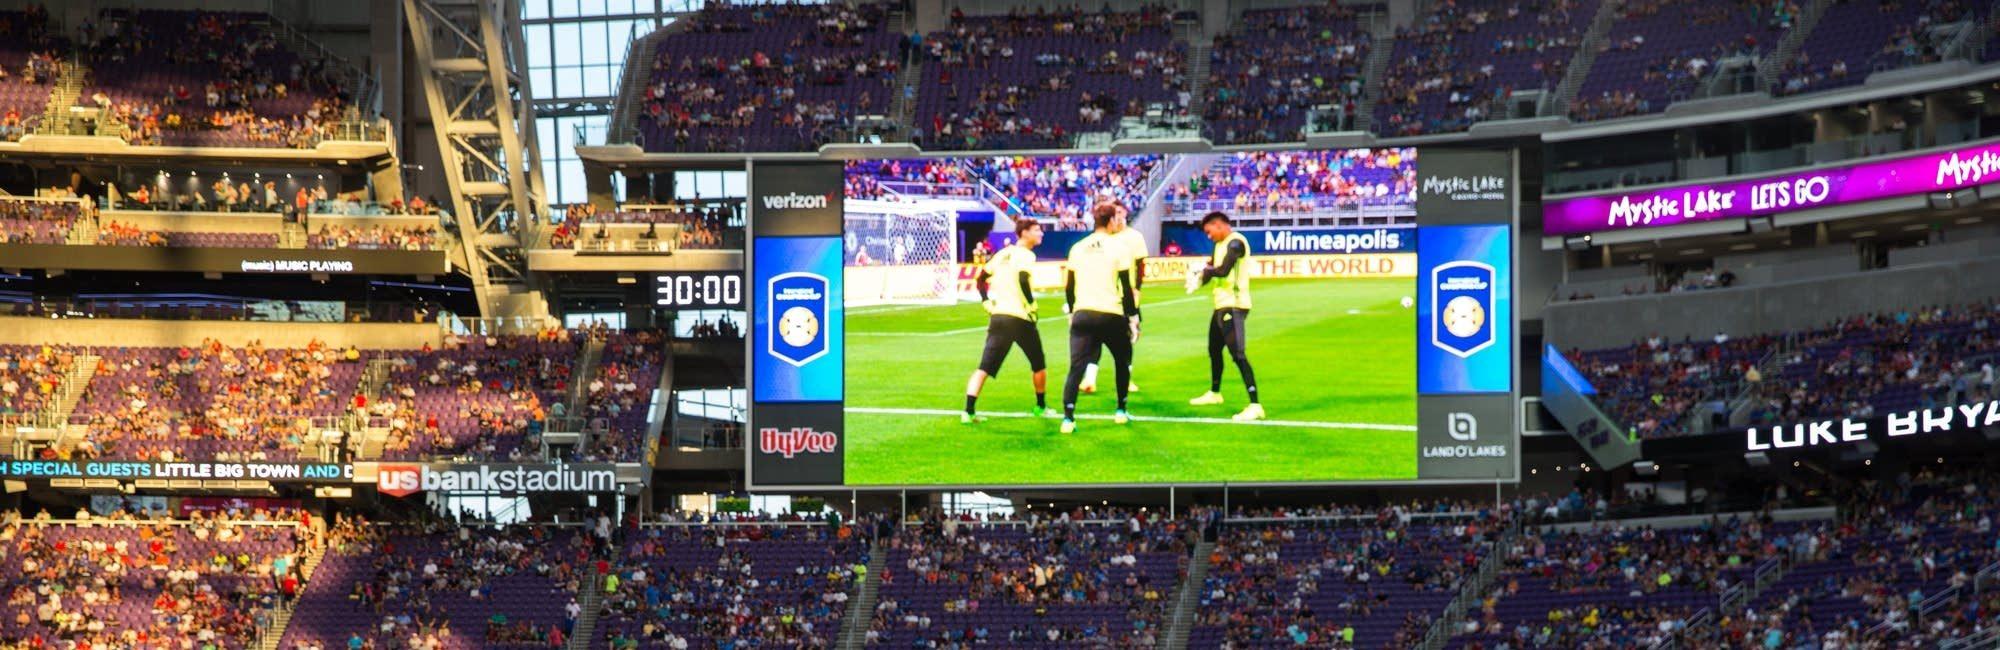 usbankstadium-soccer-with giant screen